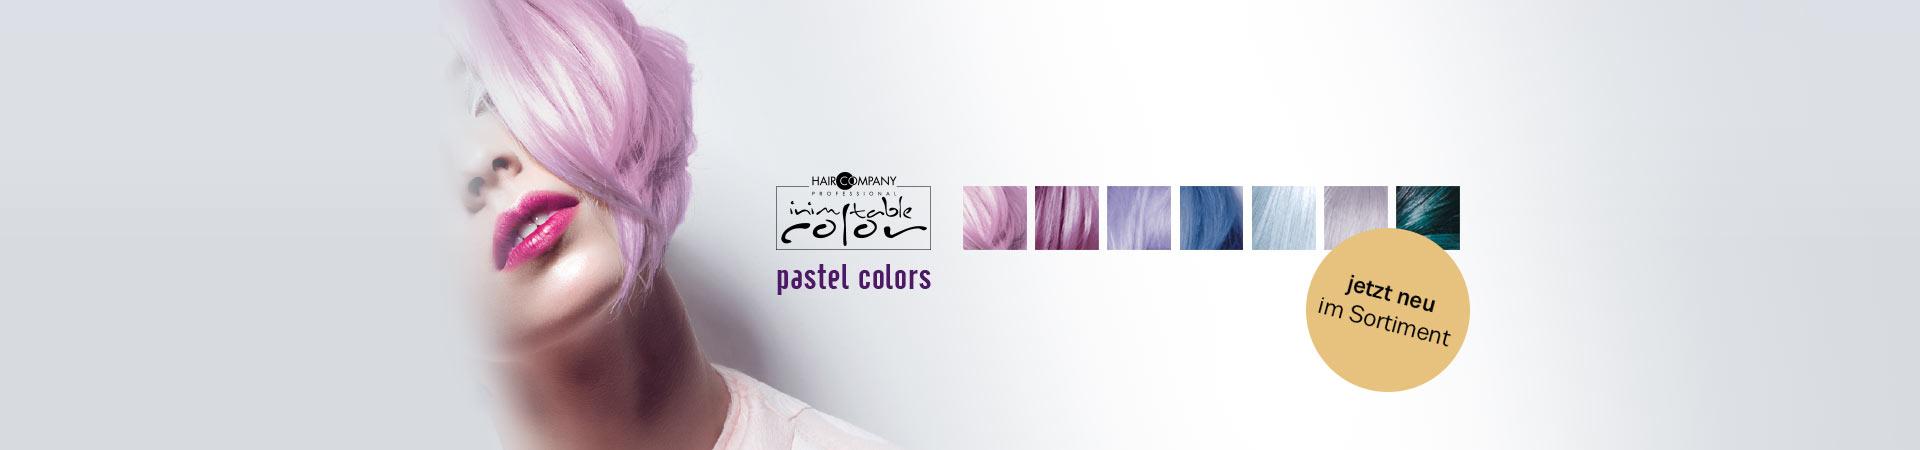 slider_startseite-2017_inimitable-color_pastel_jetzt-neu